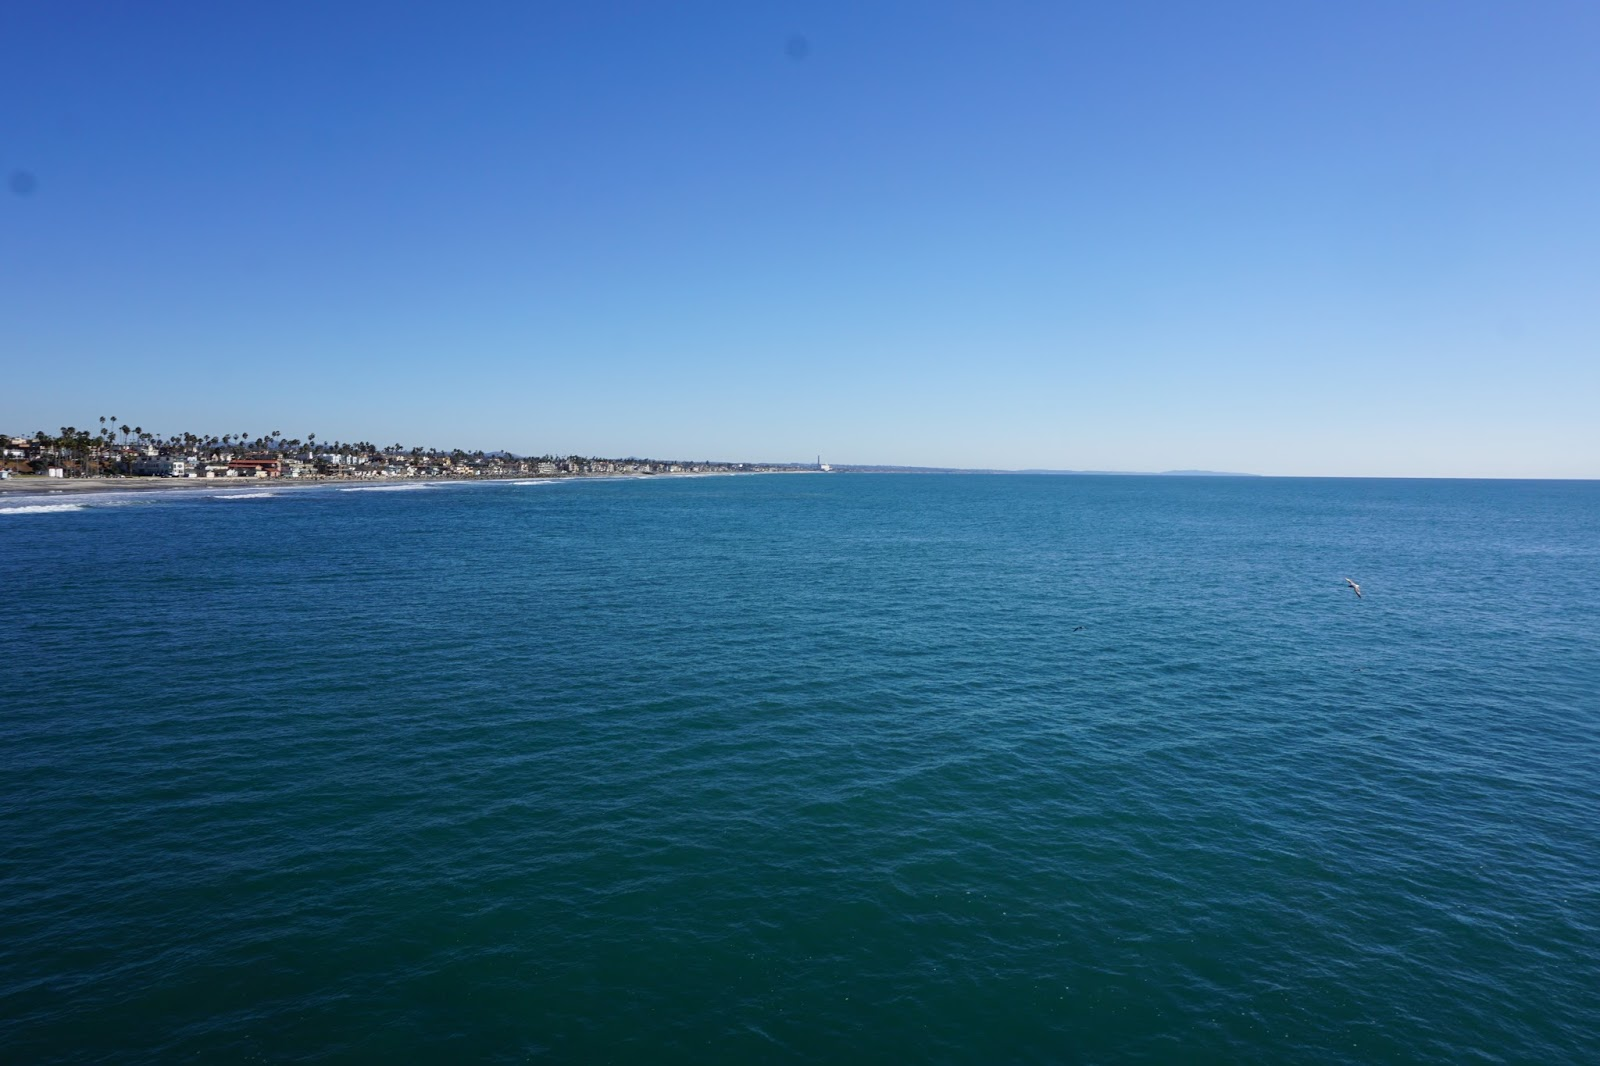 oceanside, california, beach, ocean, carlsbad